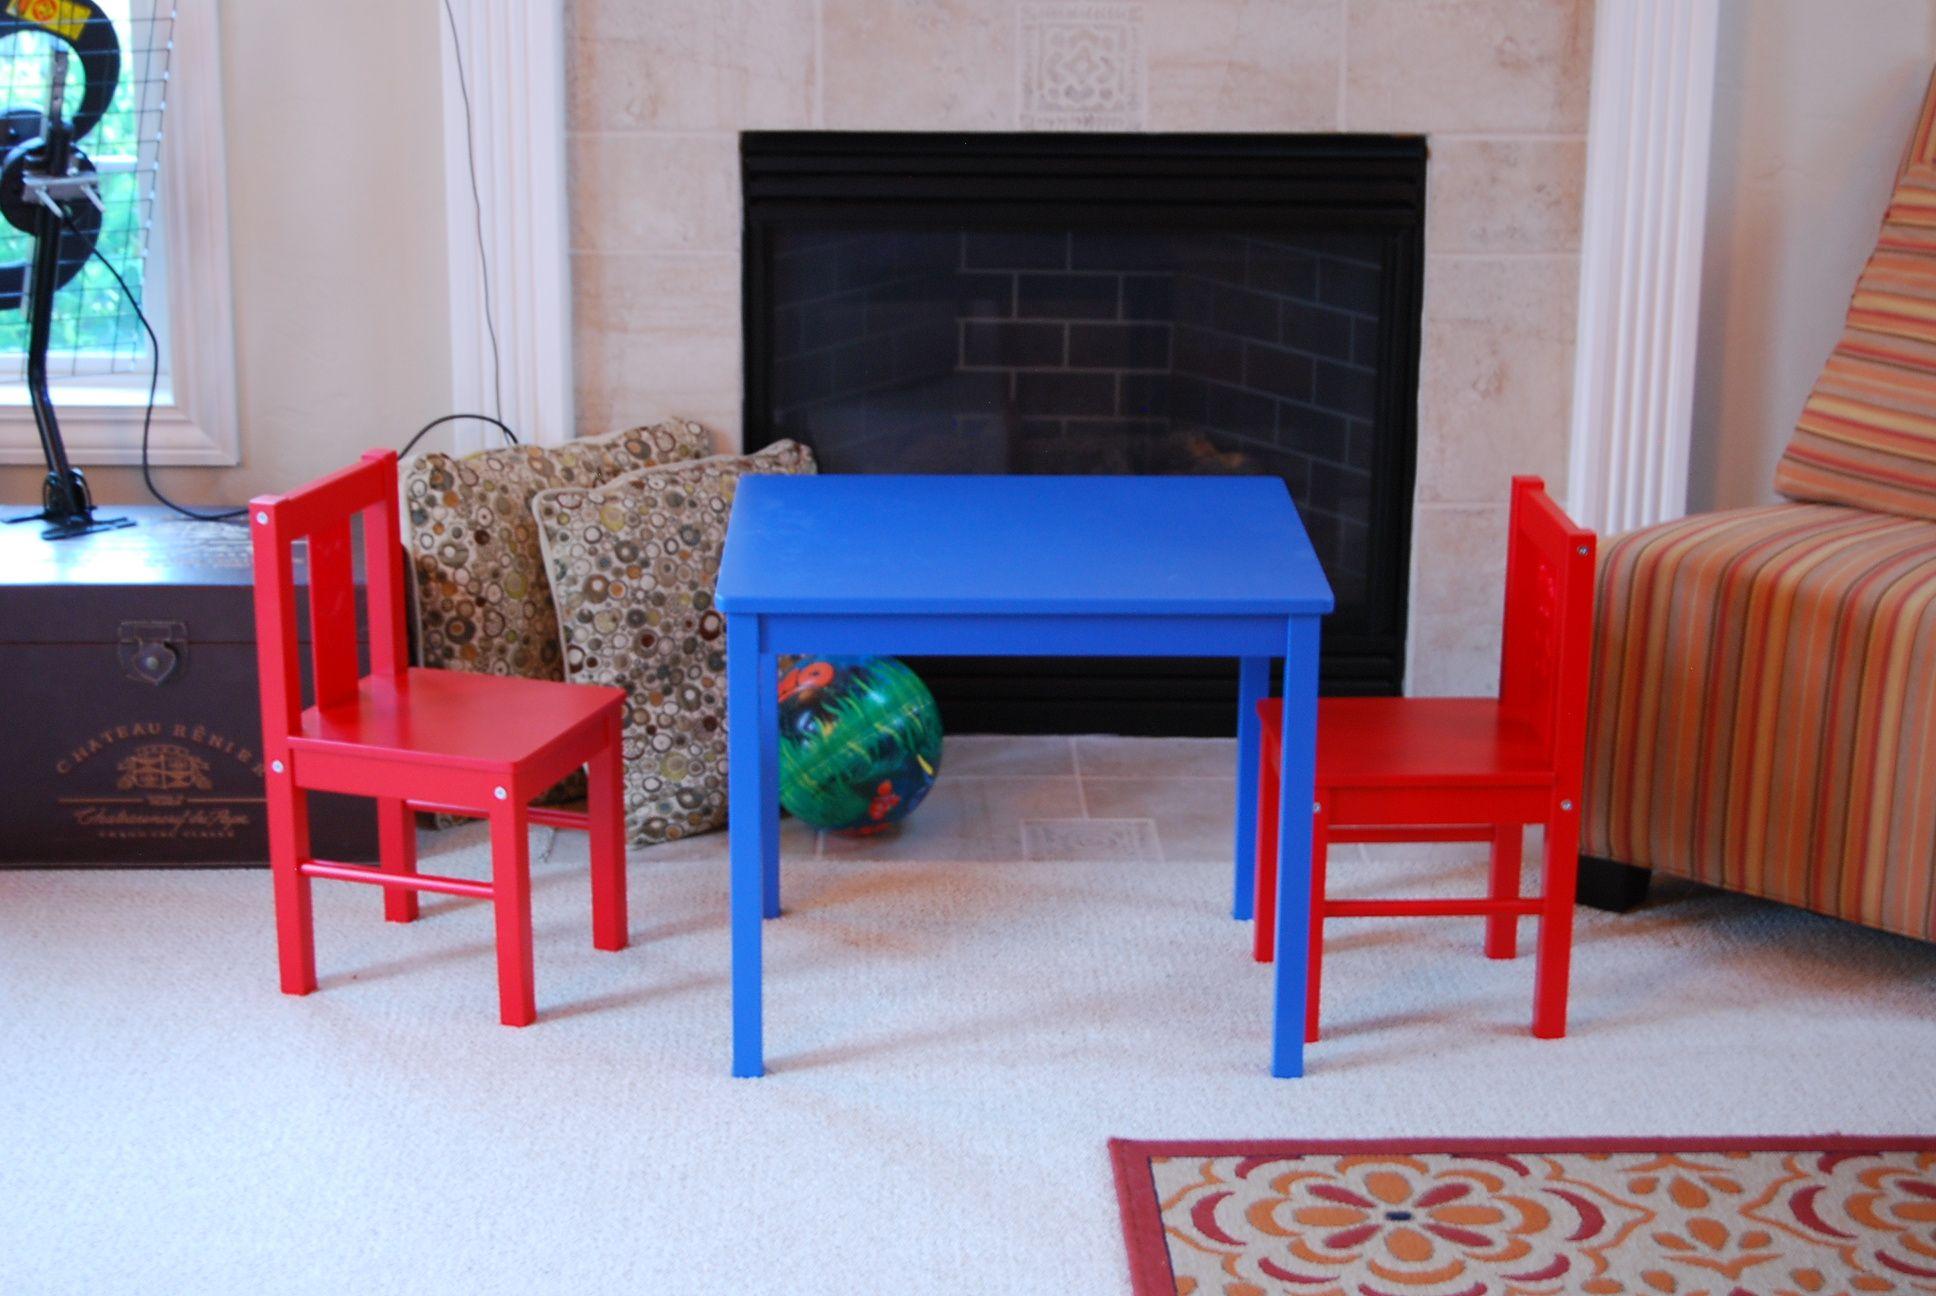 30 Best Image Of Childrens Furniture Diy Childrens Furniture Diy